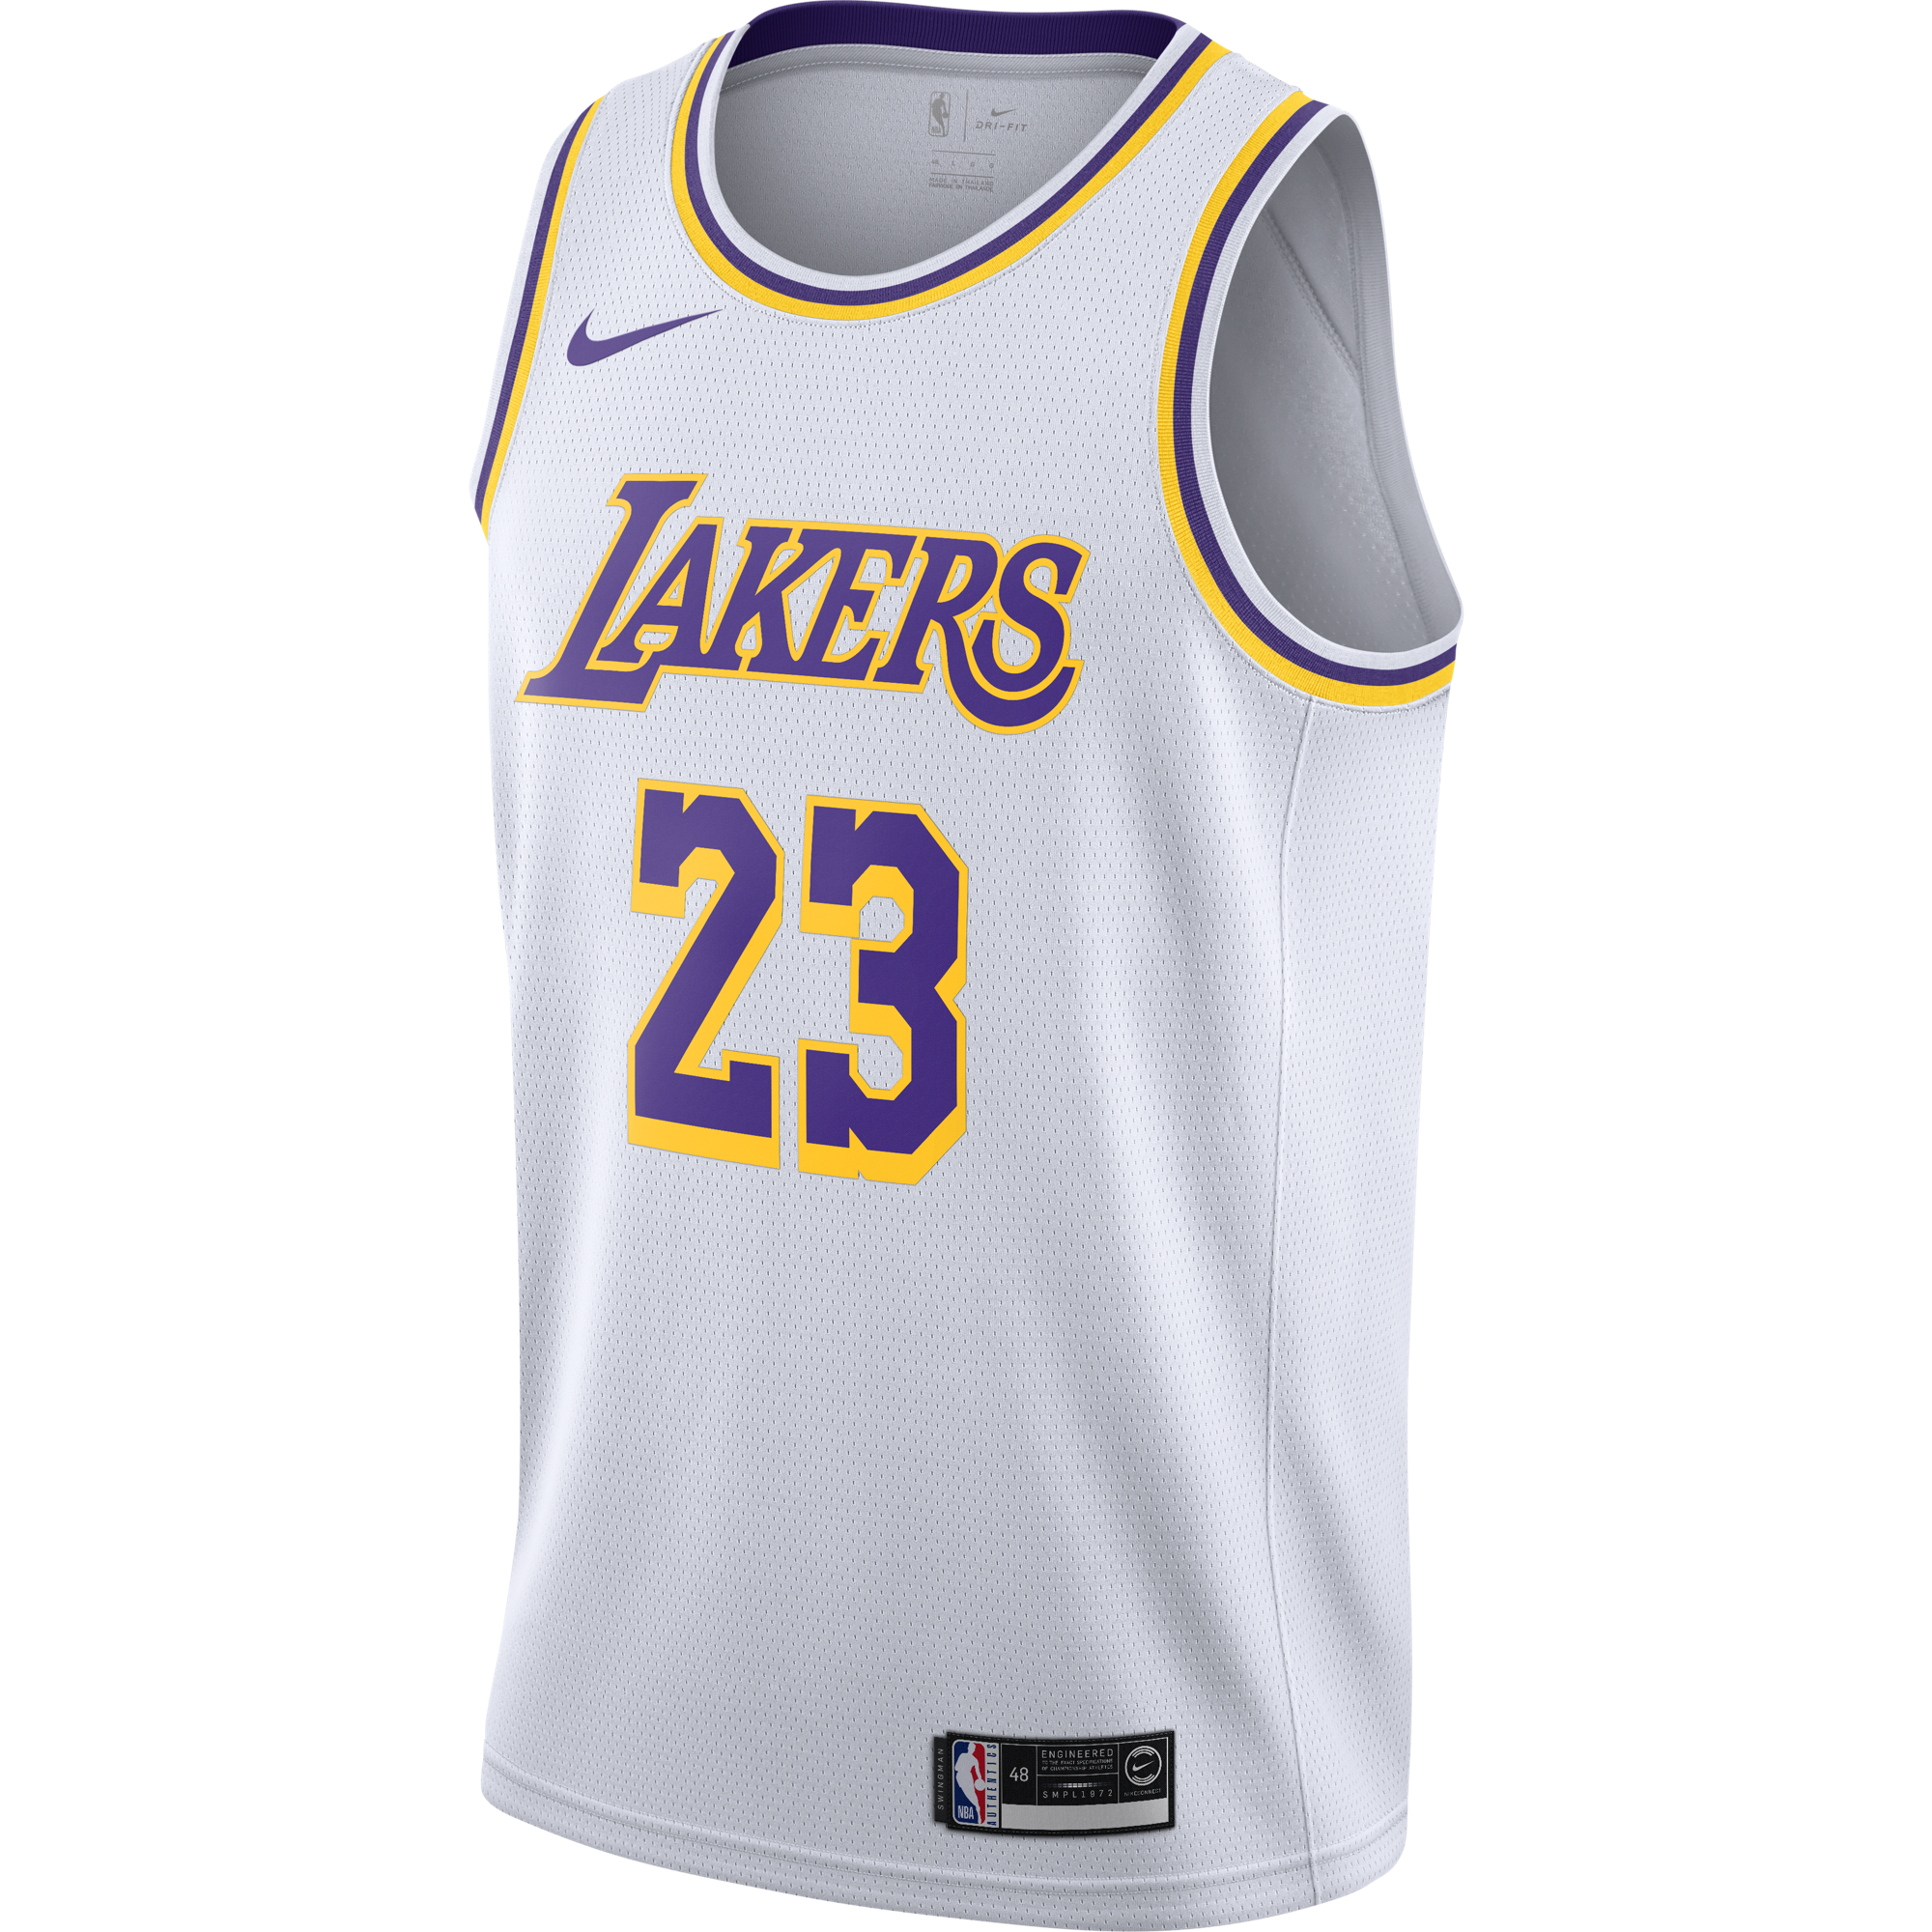 Nike Nba Los Angeles Lakers Lebron James Swingman Home Jersey For 80 00 Kicksmaniac Com